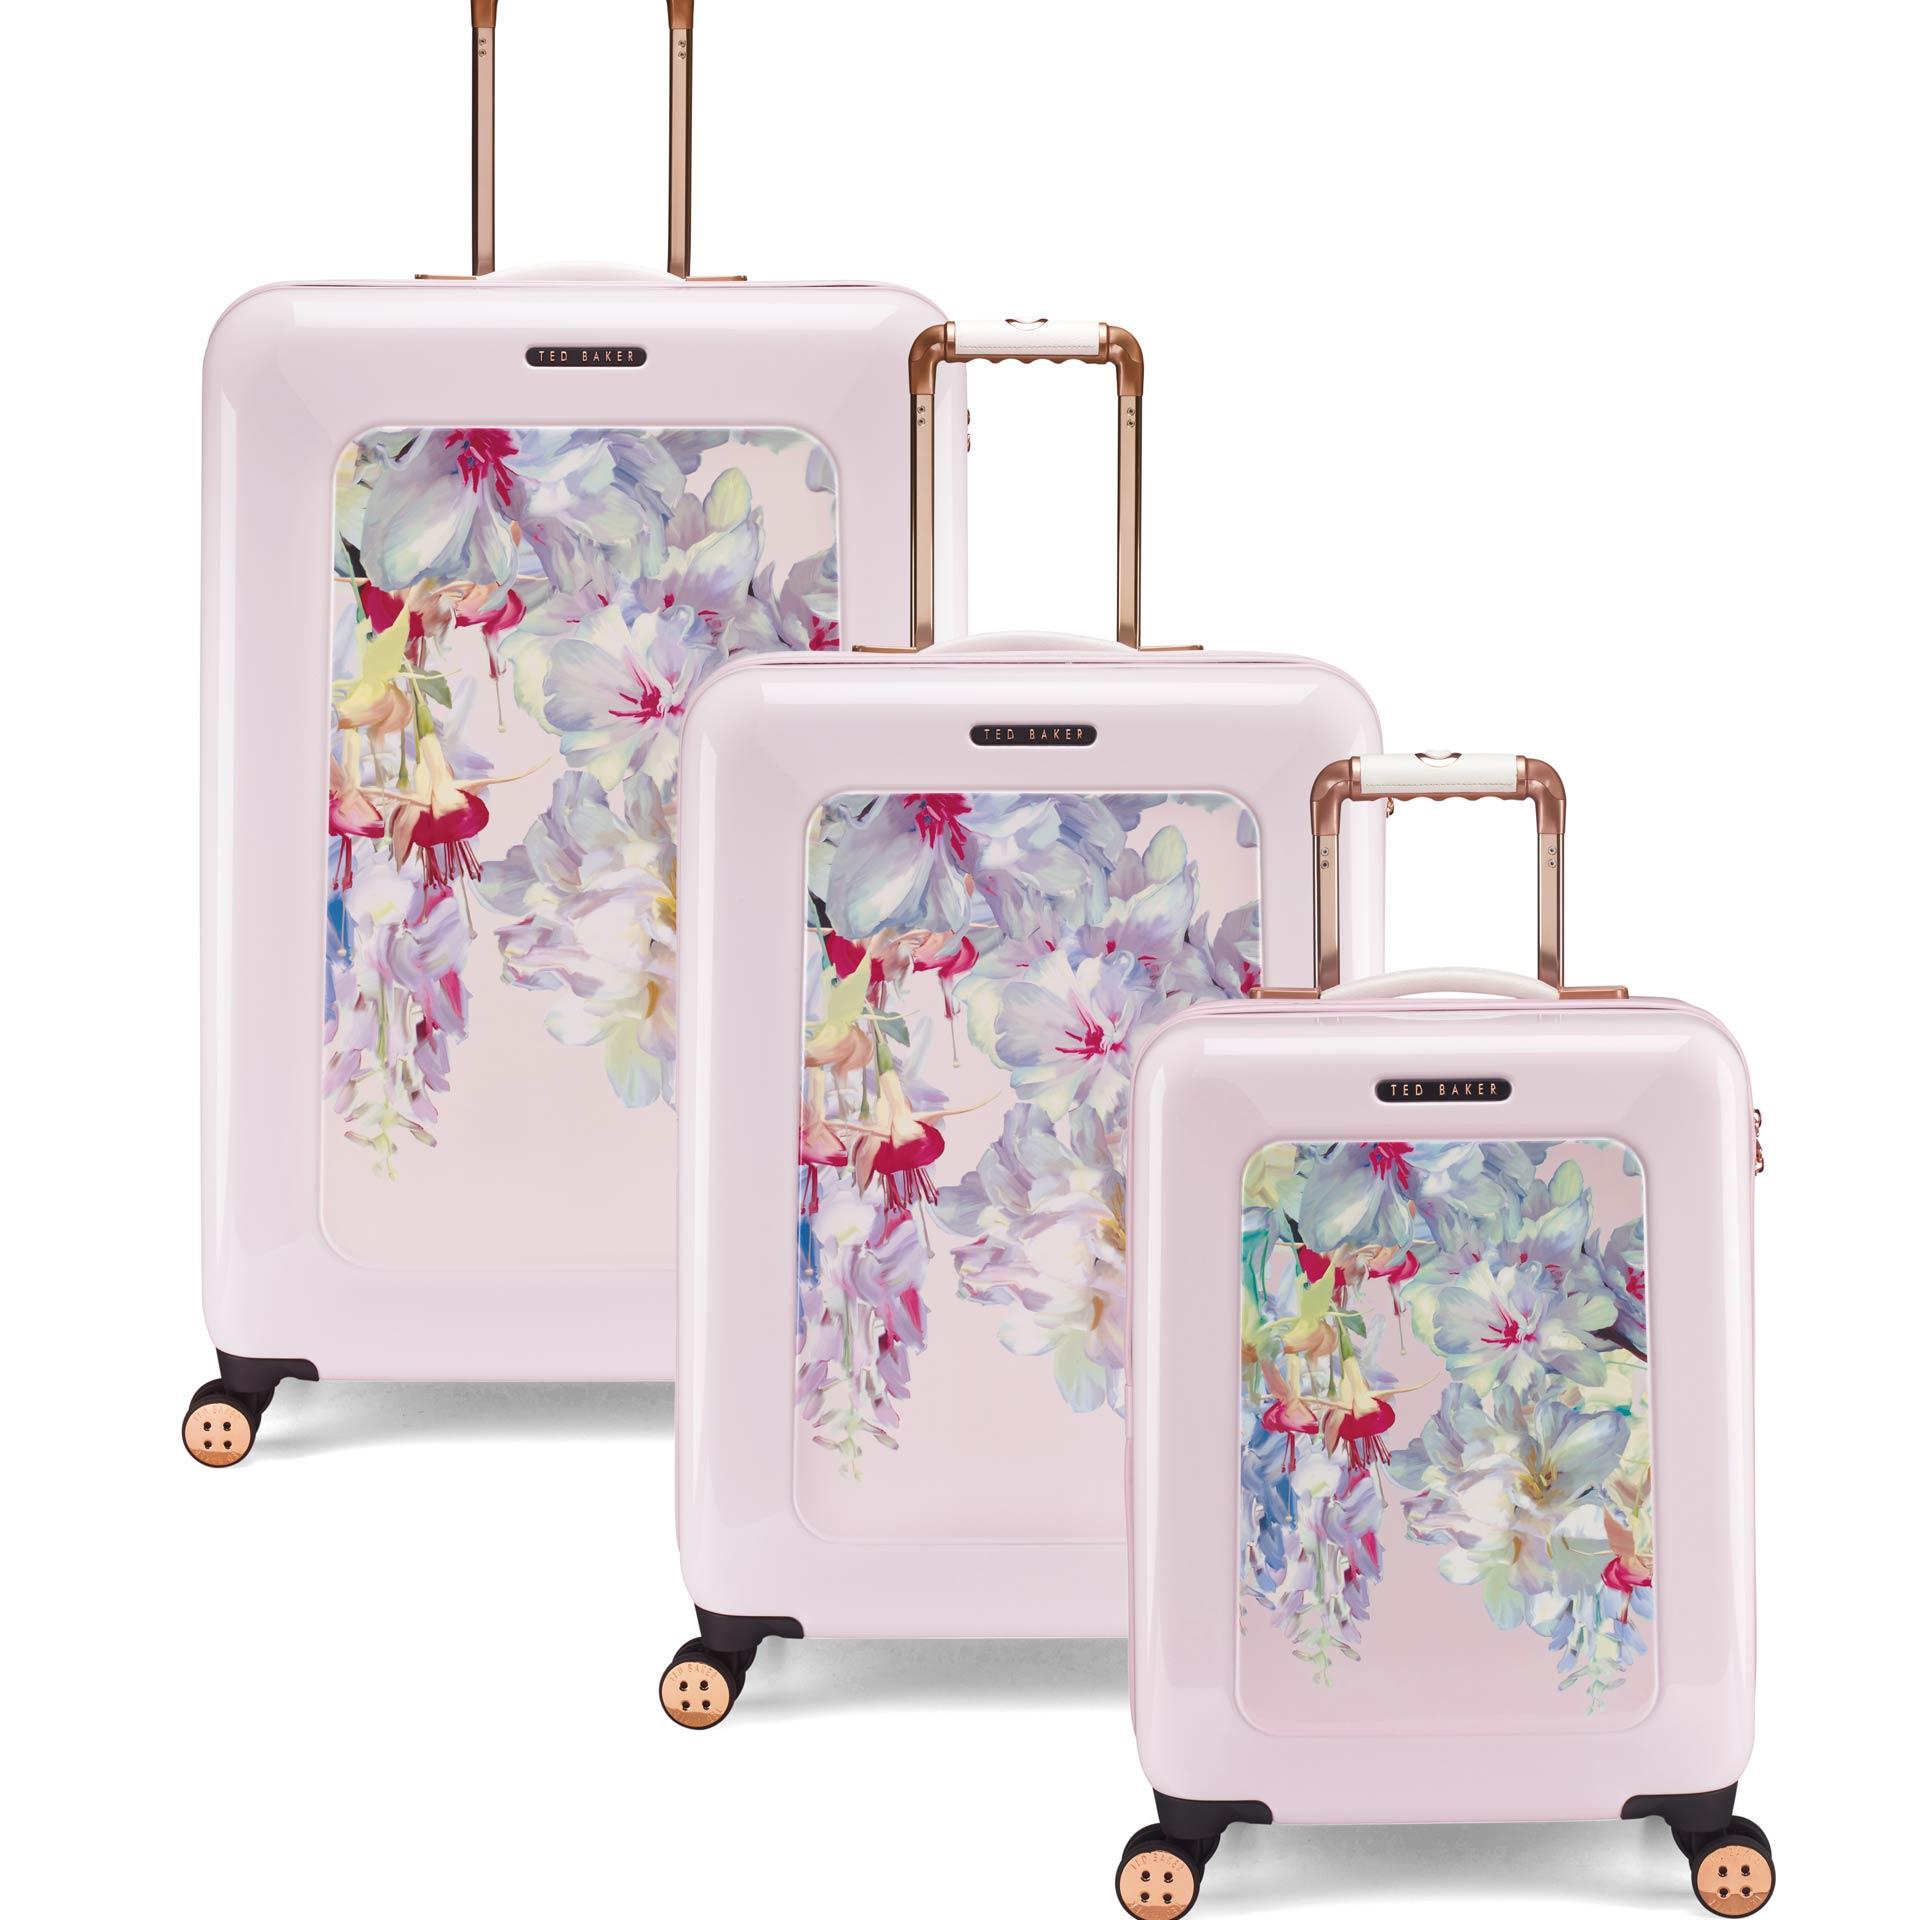 0f89078d77c ted-baker-luggage-1920-x-1920 - Creaseys : Creaseys